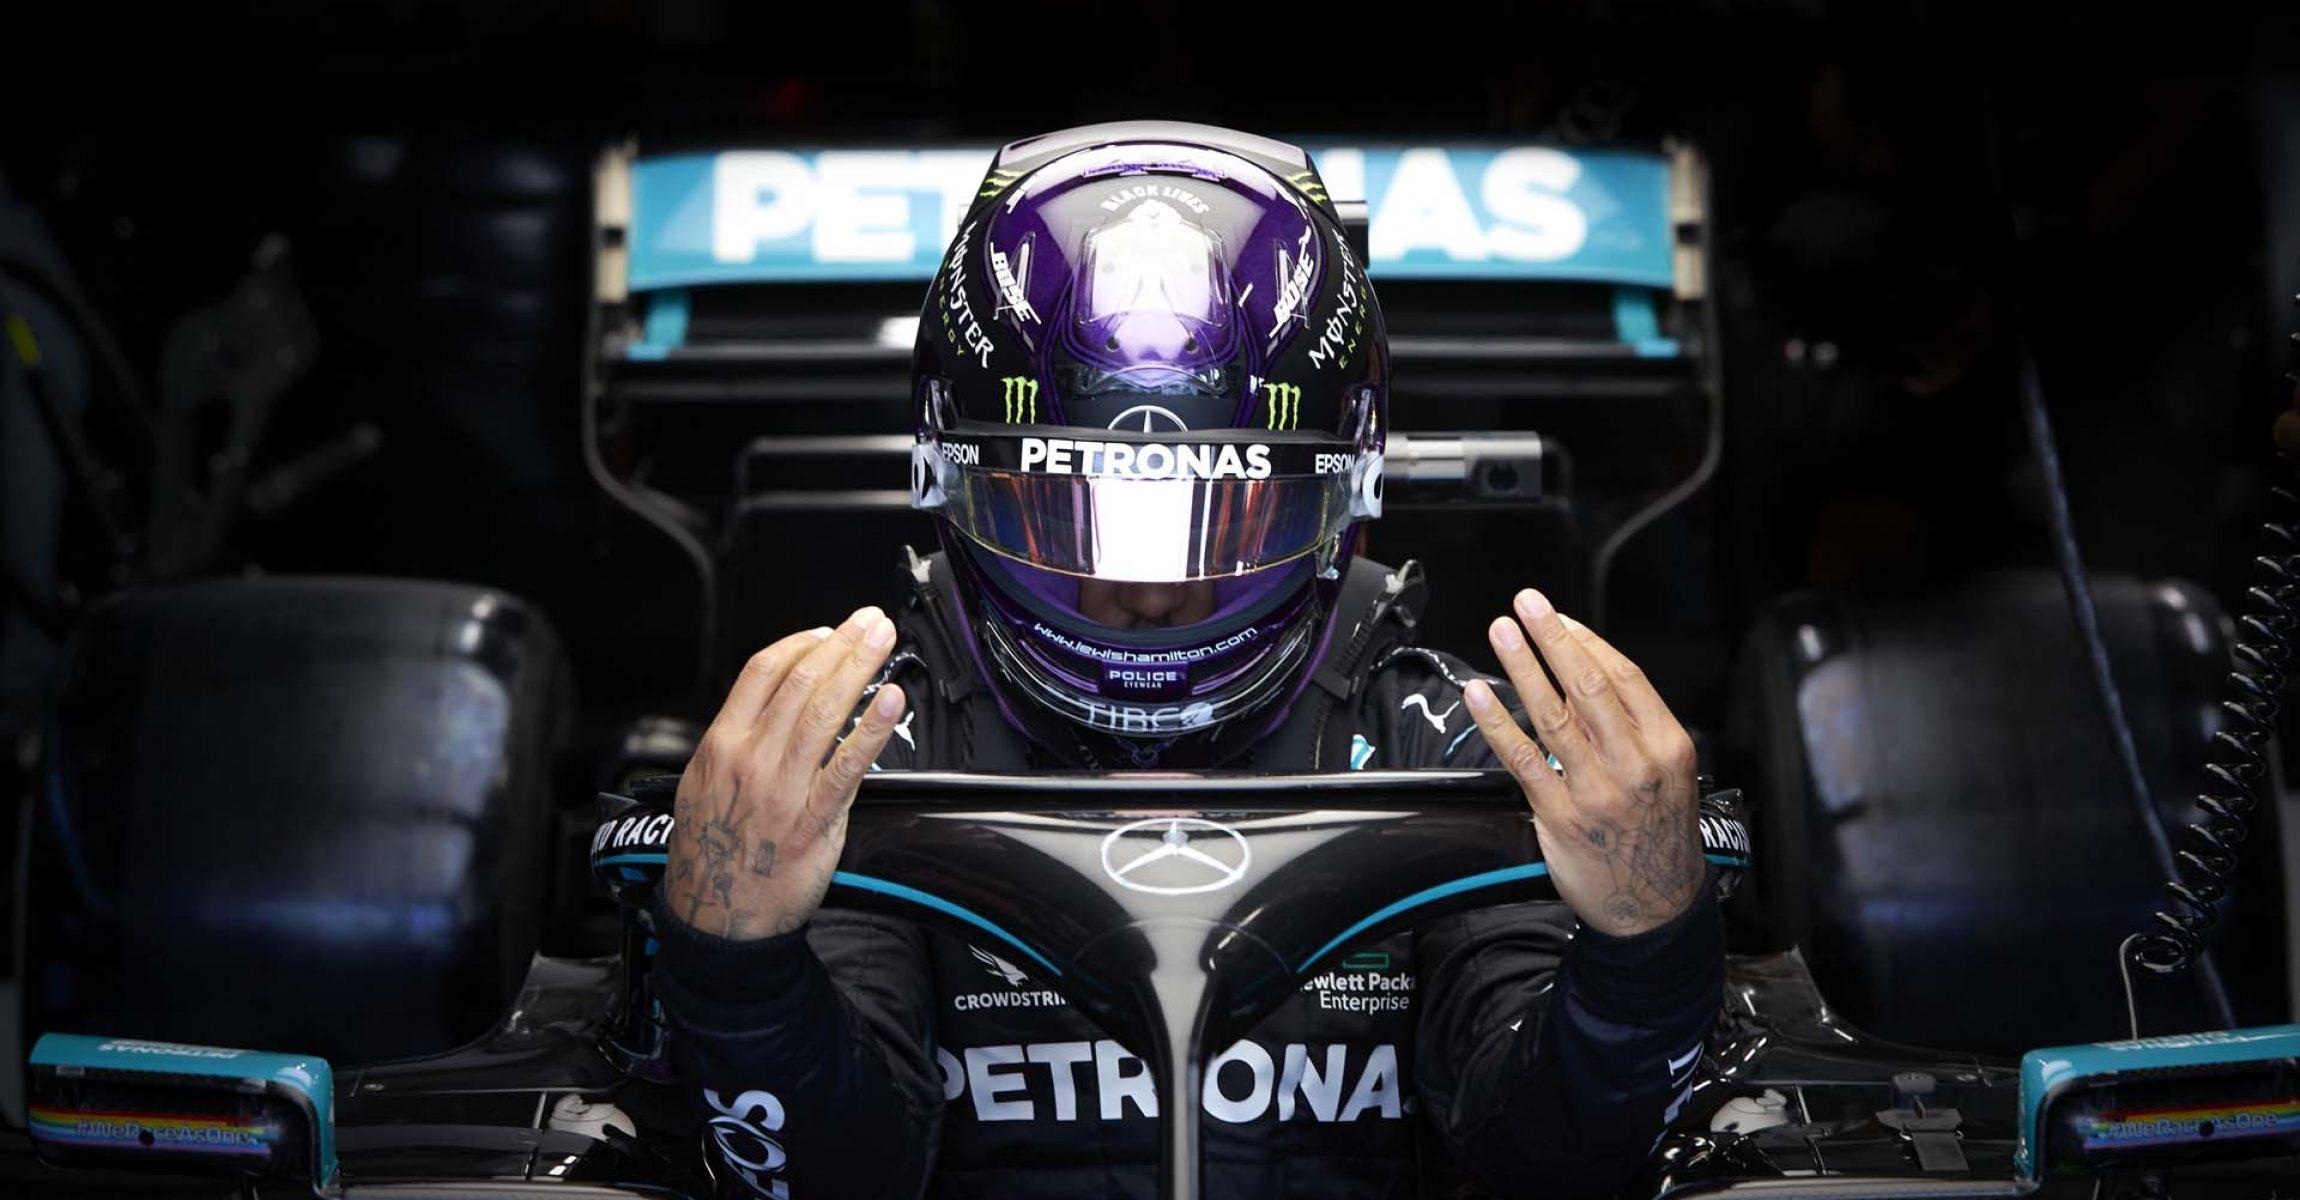 2020 Hungarian Grand Prix, Saturday - Steve Etherington Lewis Hamilton Mercedes